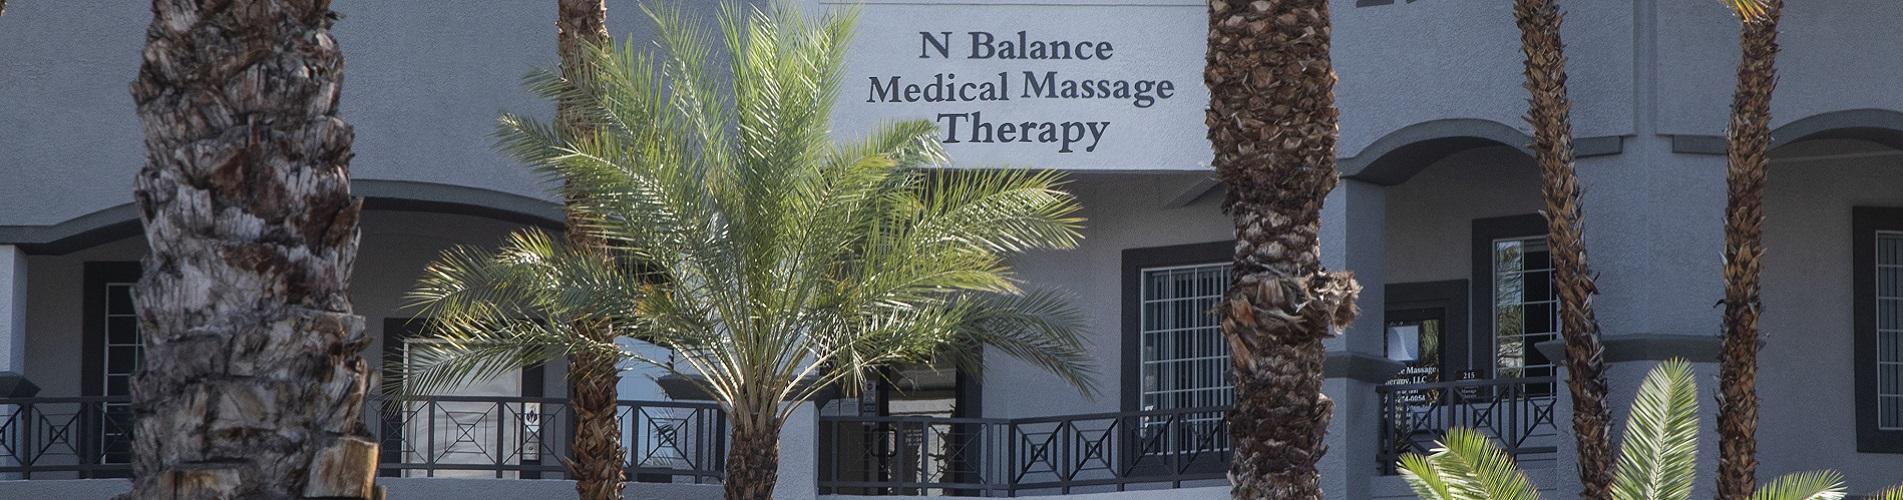 N Balance Outside Building